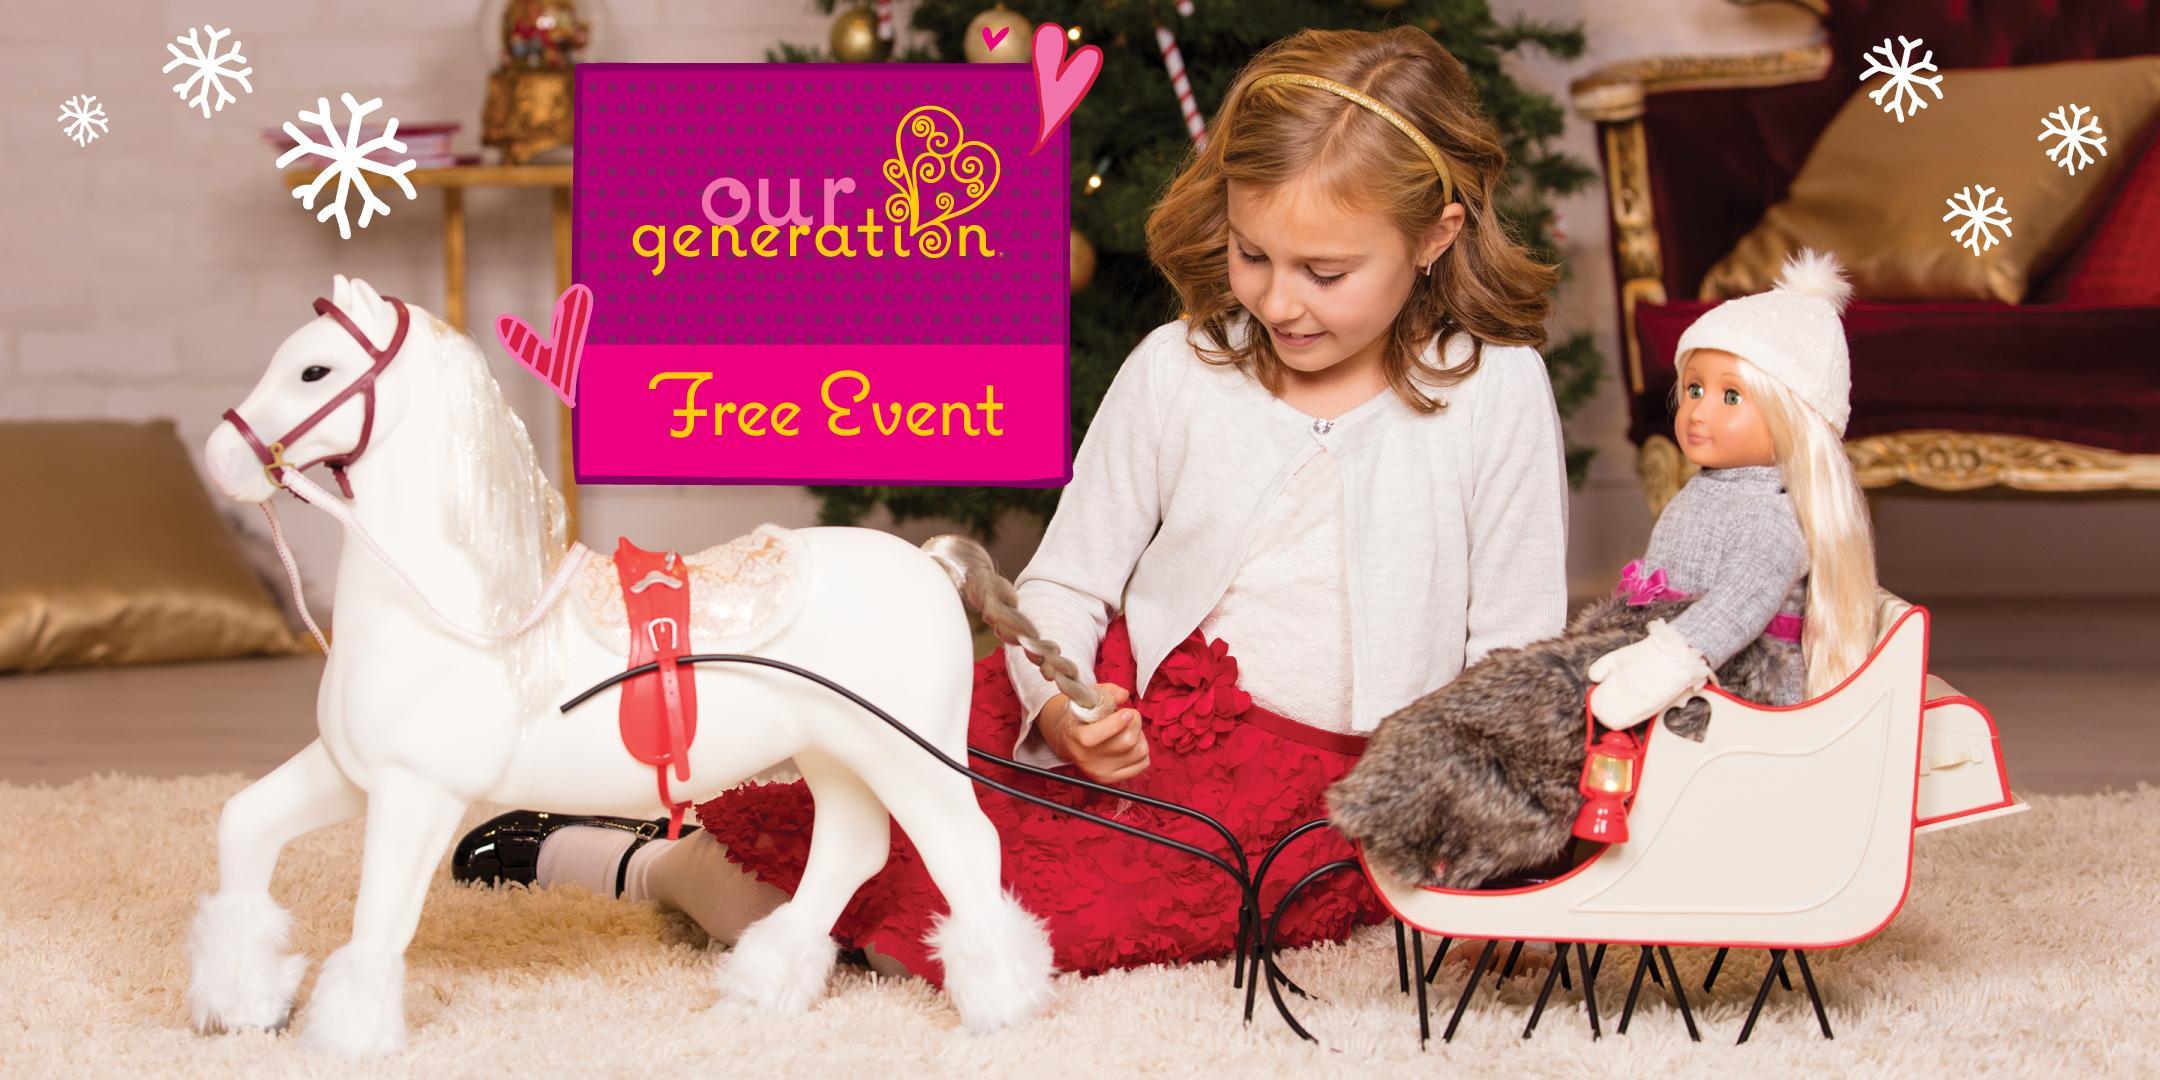 Free Holiday Event for Kids - Target San Antonio (Bandera), TX